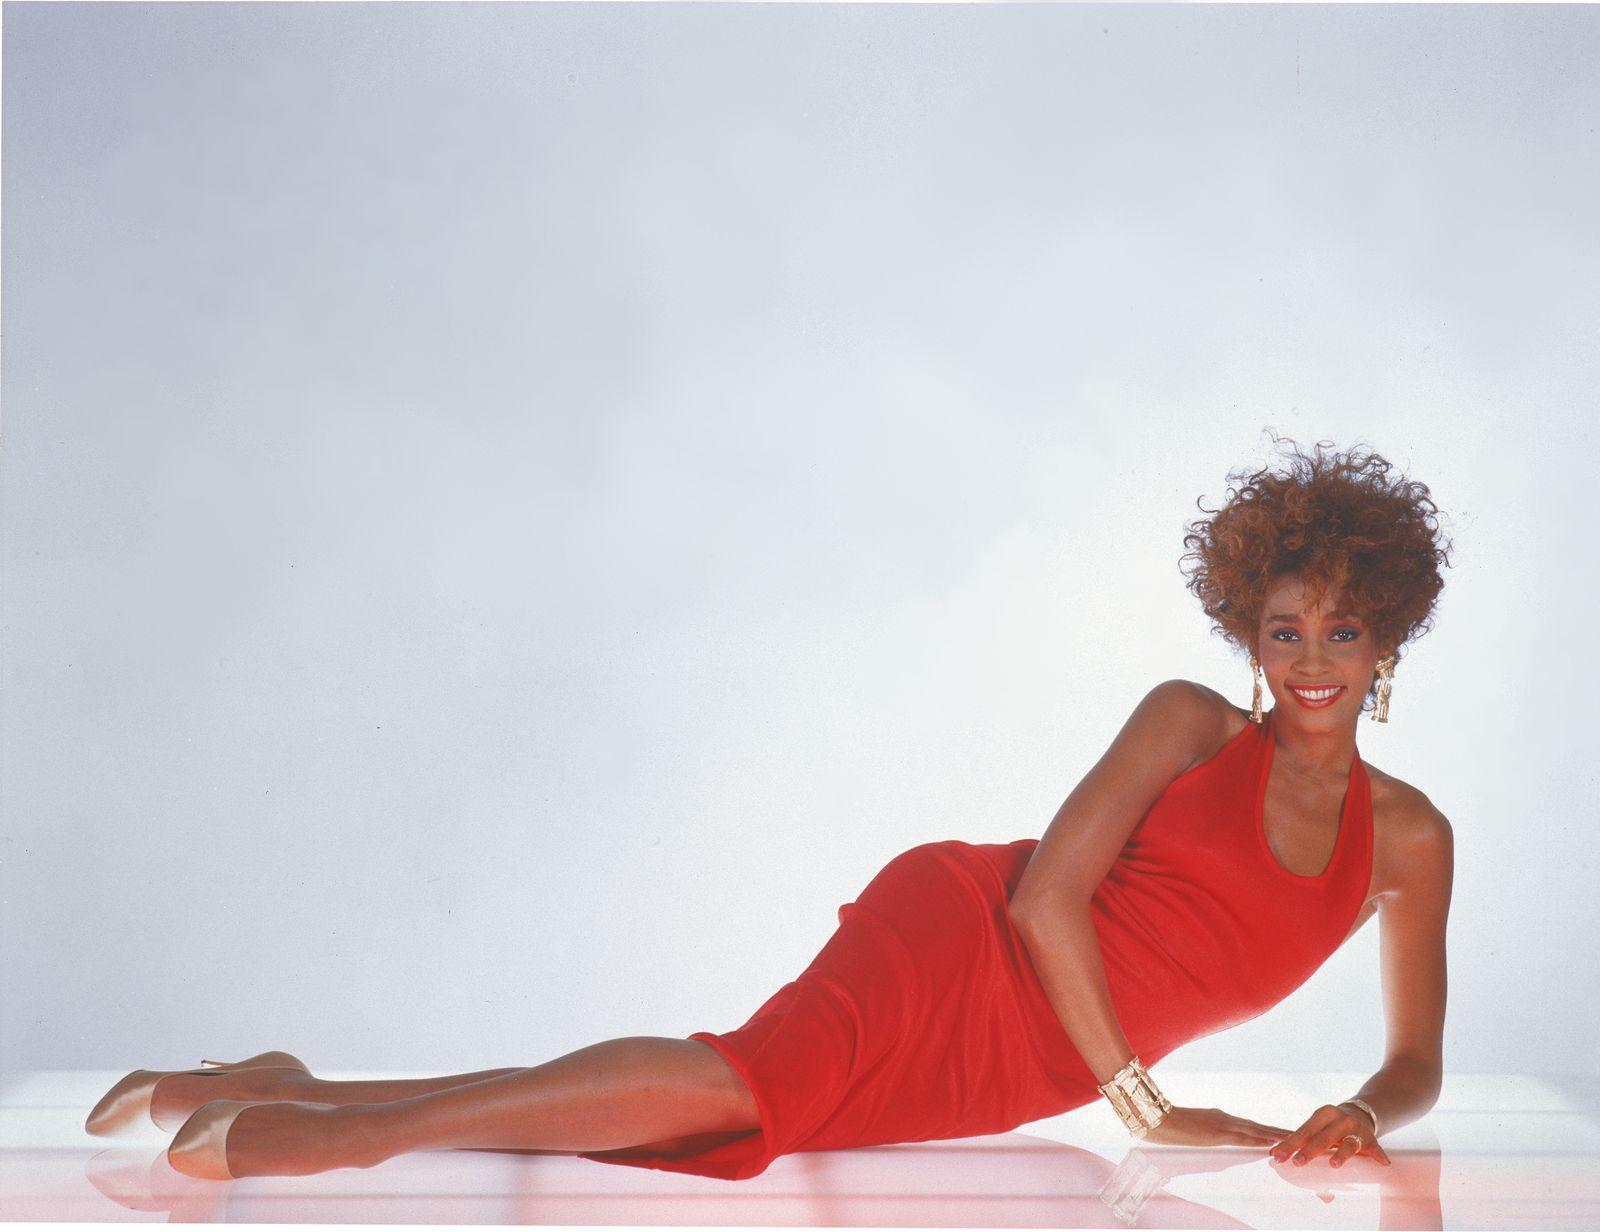 Henkersmahlzeit - Portrait of singer Whitney Houston